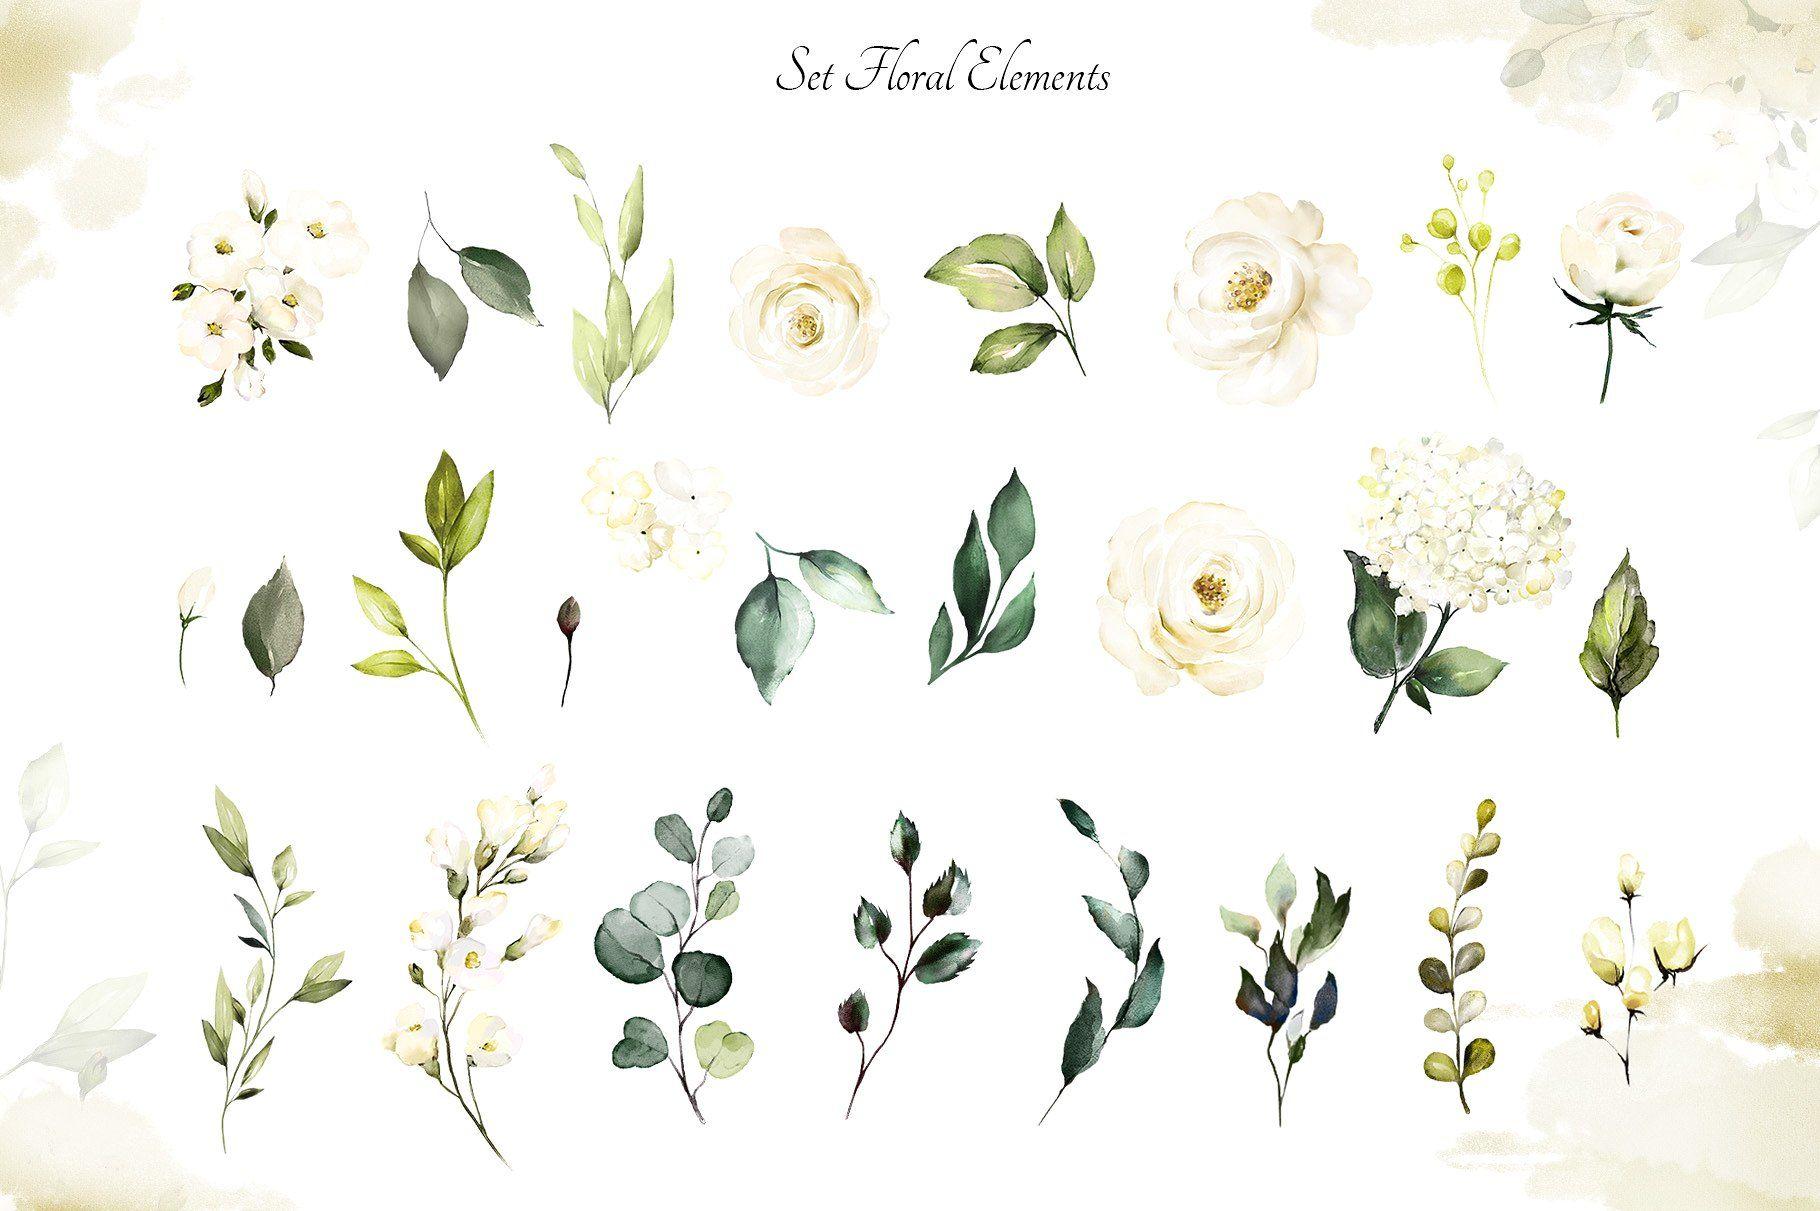 White Roses Watercolor Floral Set Floral Watercolor White Roses Floral Sets